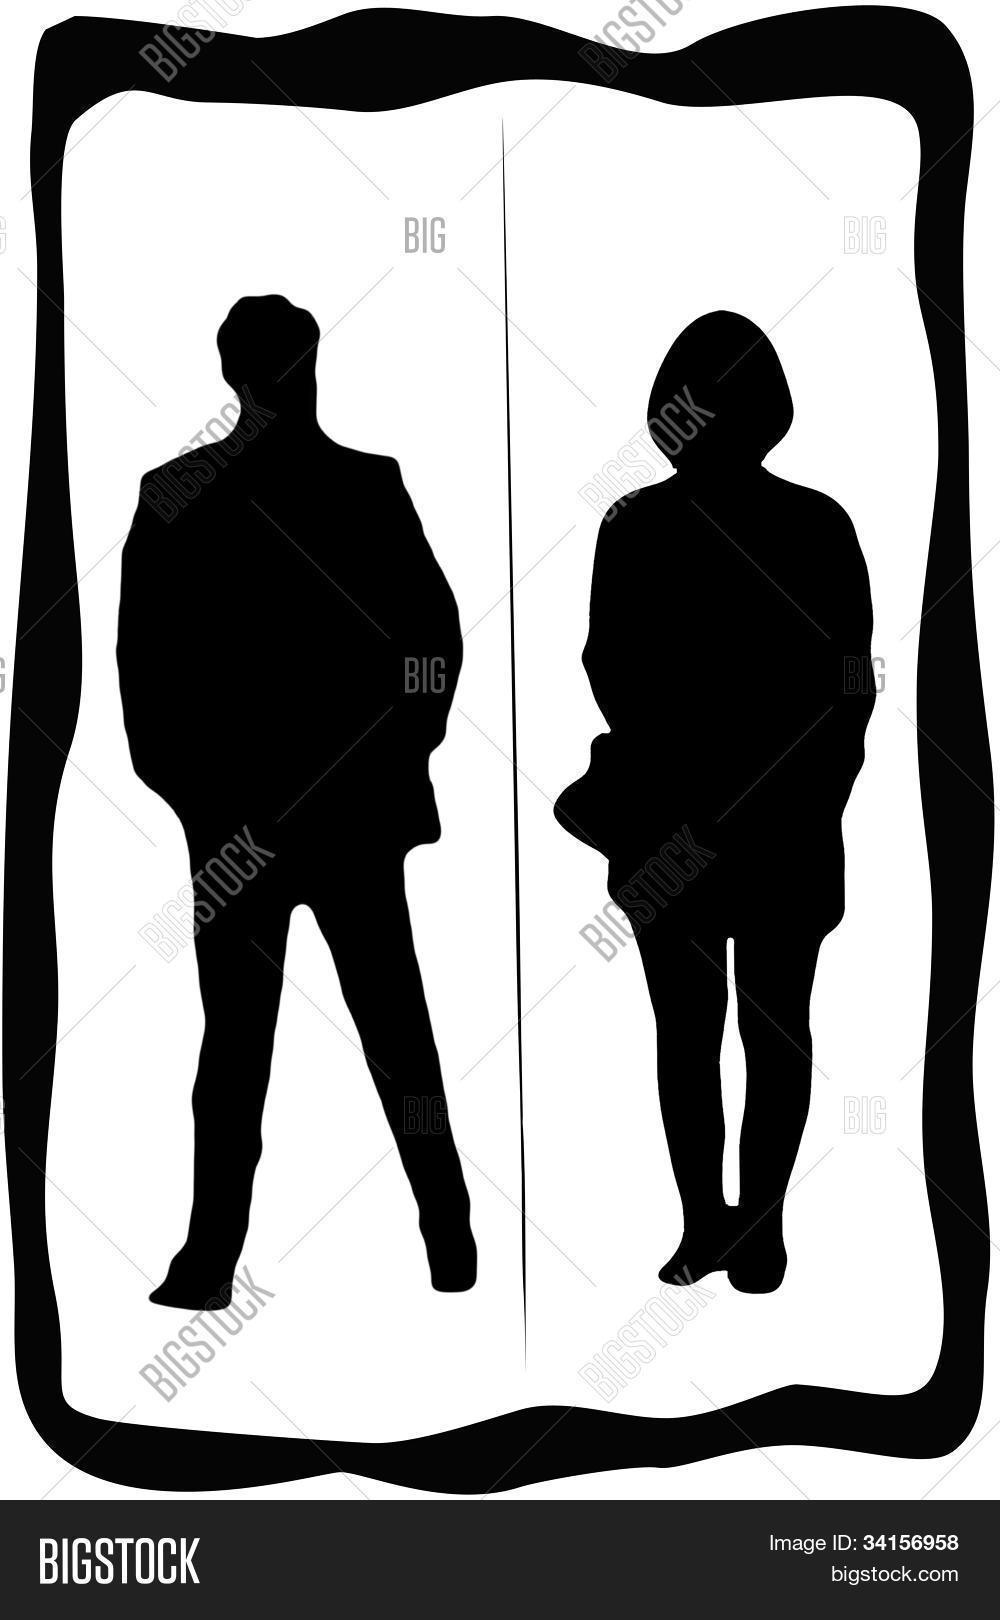 bathroom,boy,door,female,health,higiene,hygiene,icon,information,lady,lavatory,ma'am,male,man,men,outline,people,public,red,restroom,room,sanitary,sign,signal,silhouette,sinal,spa,sugestion,sym,symbol,toilet,wc,white,woman